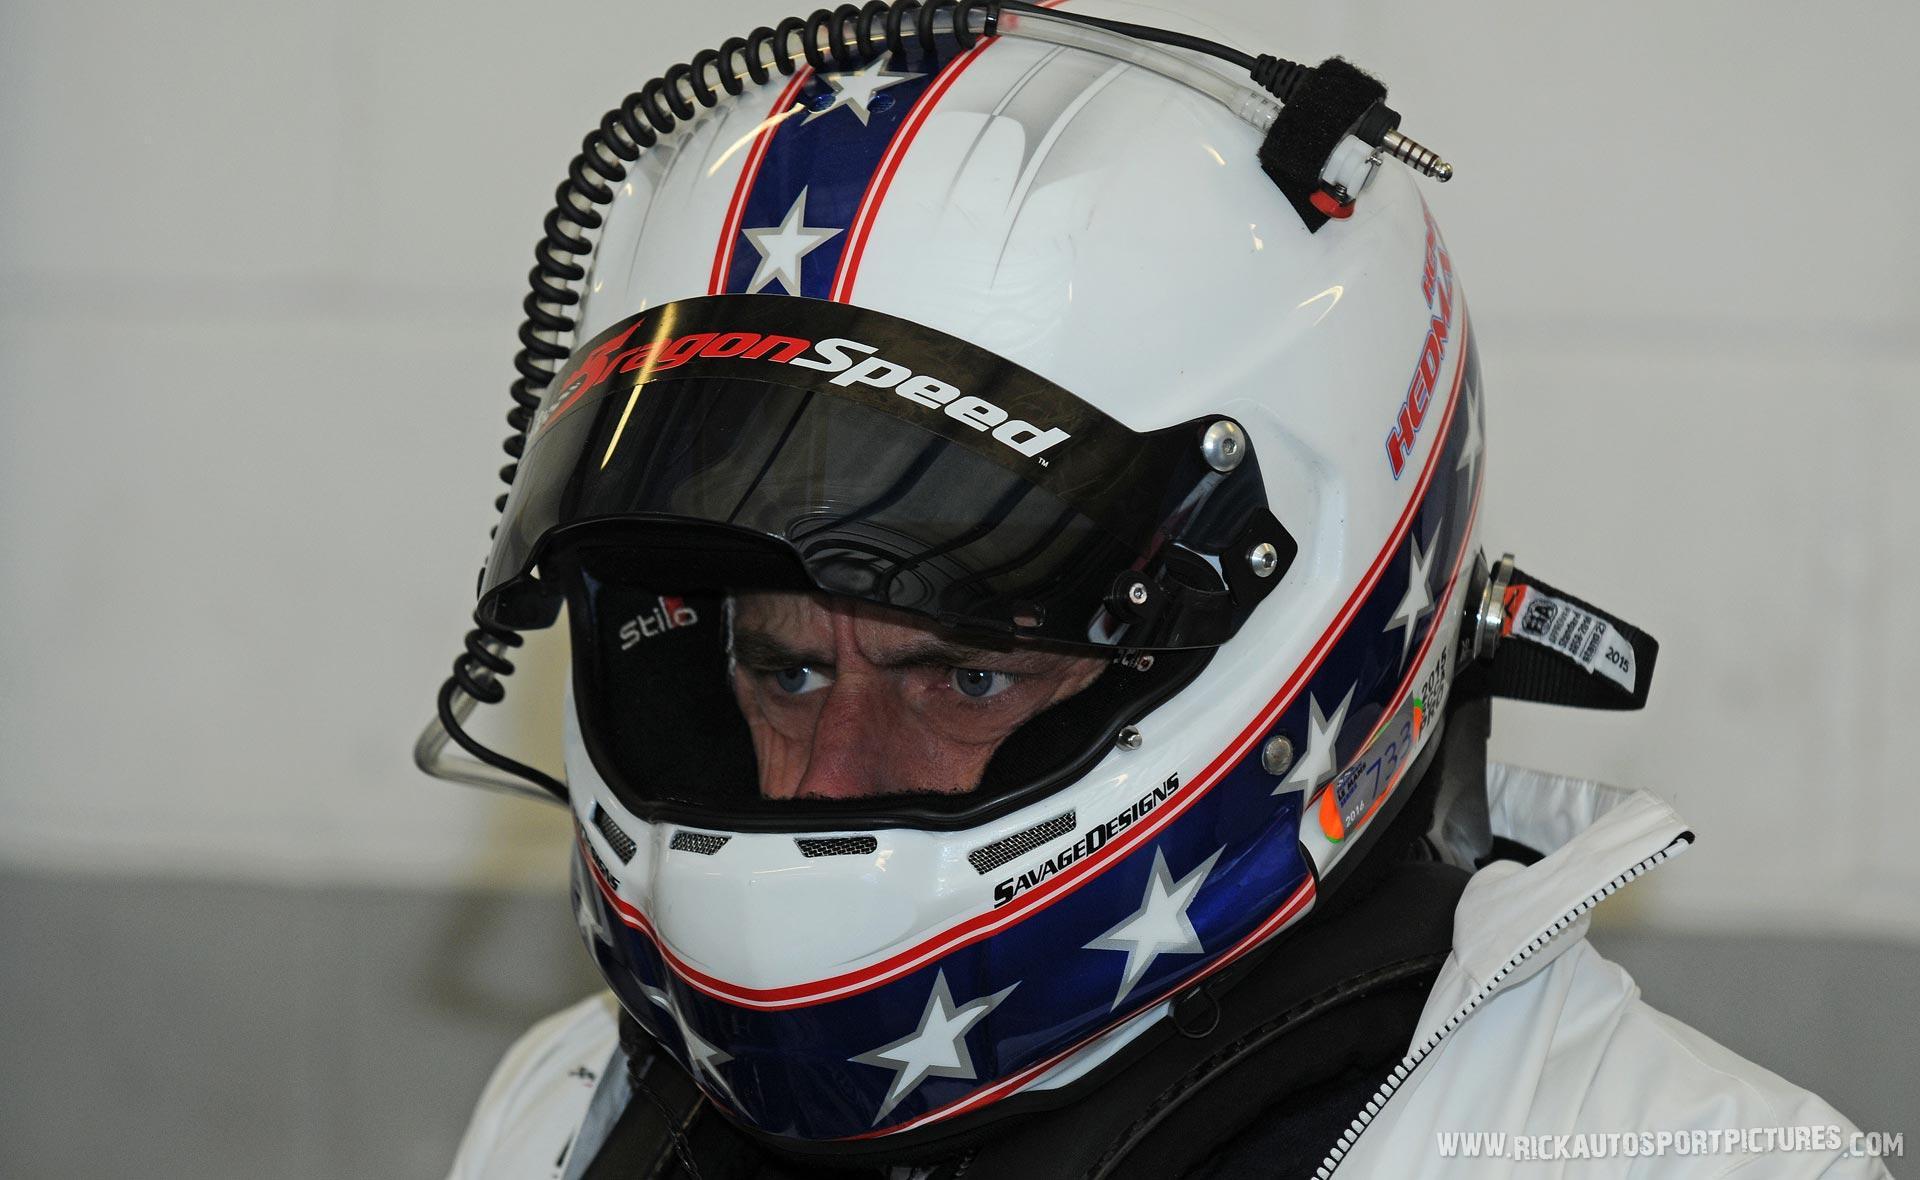 Henrik Hedman Silverstone 2016